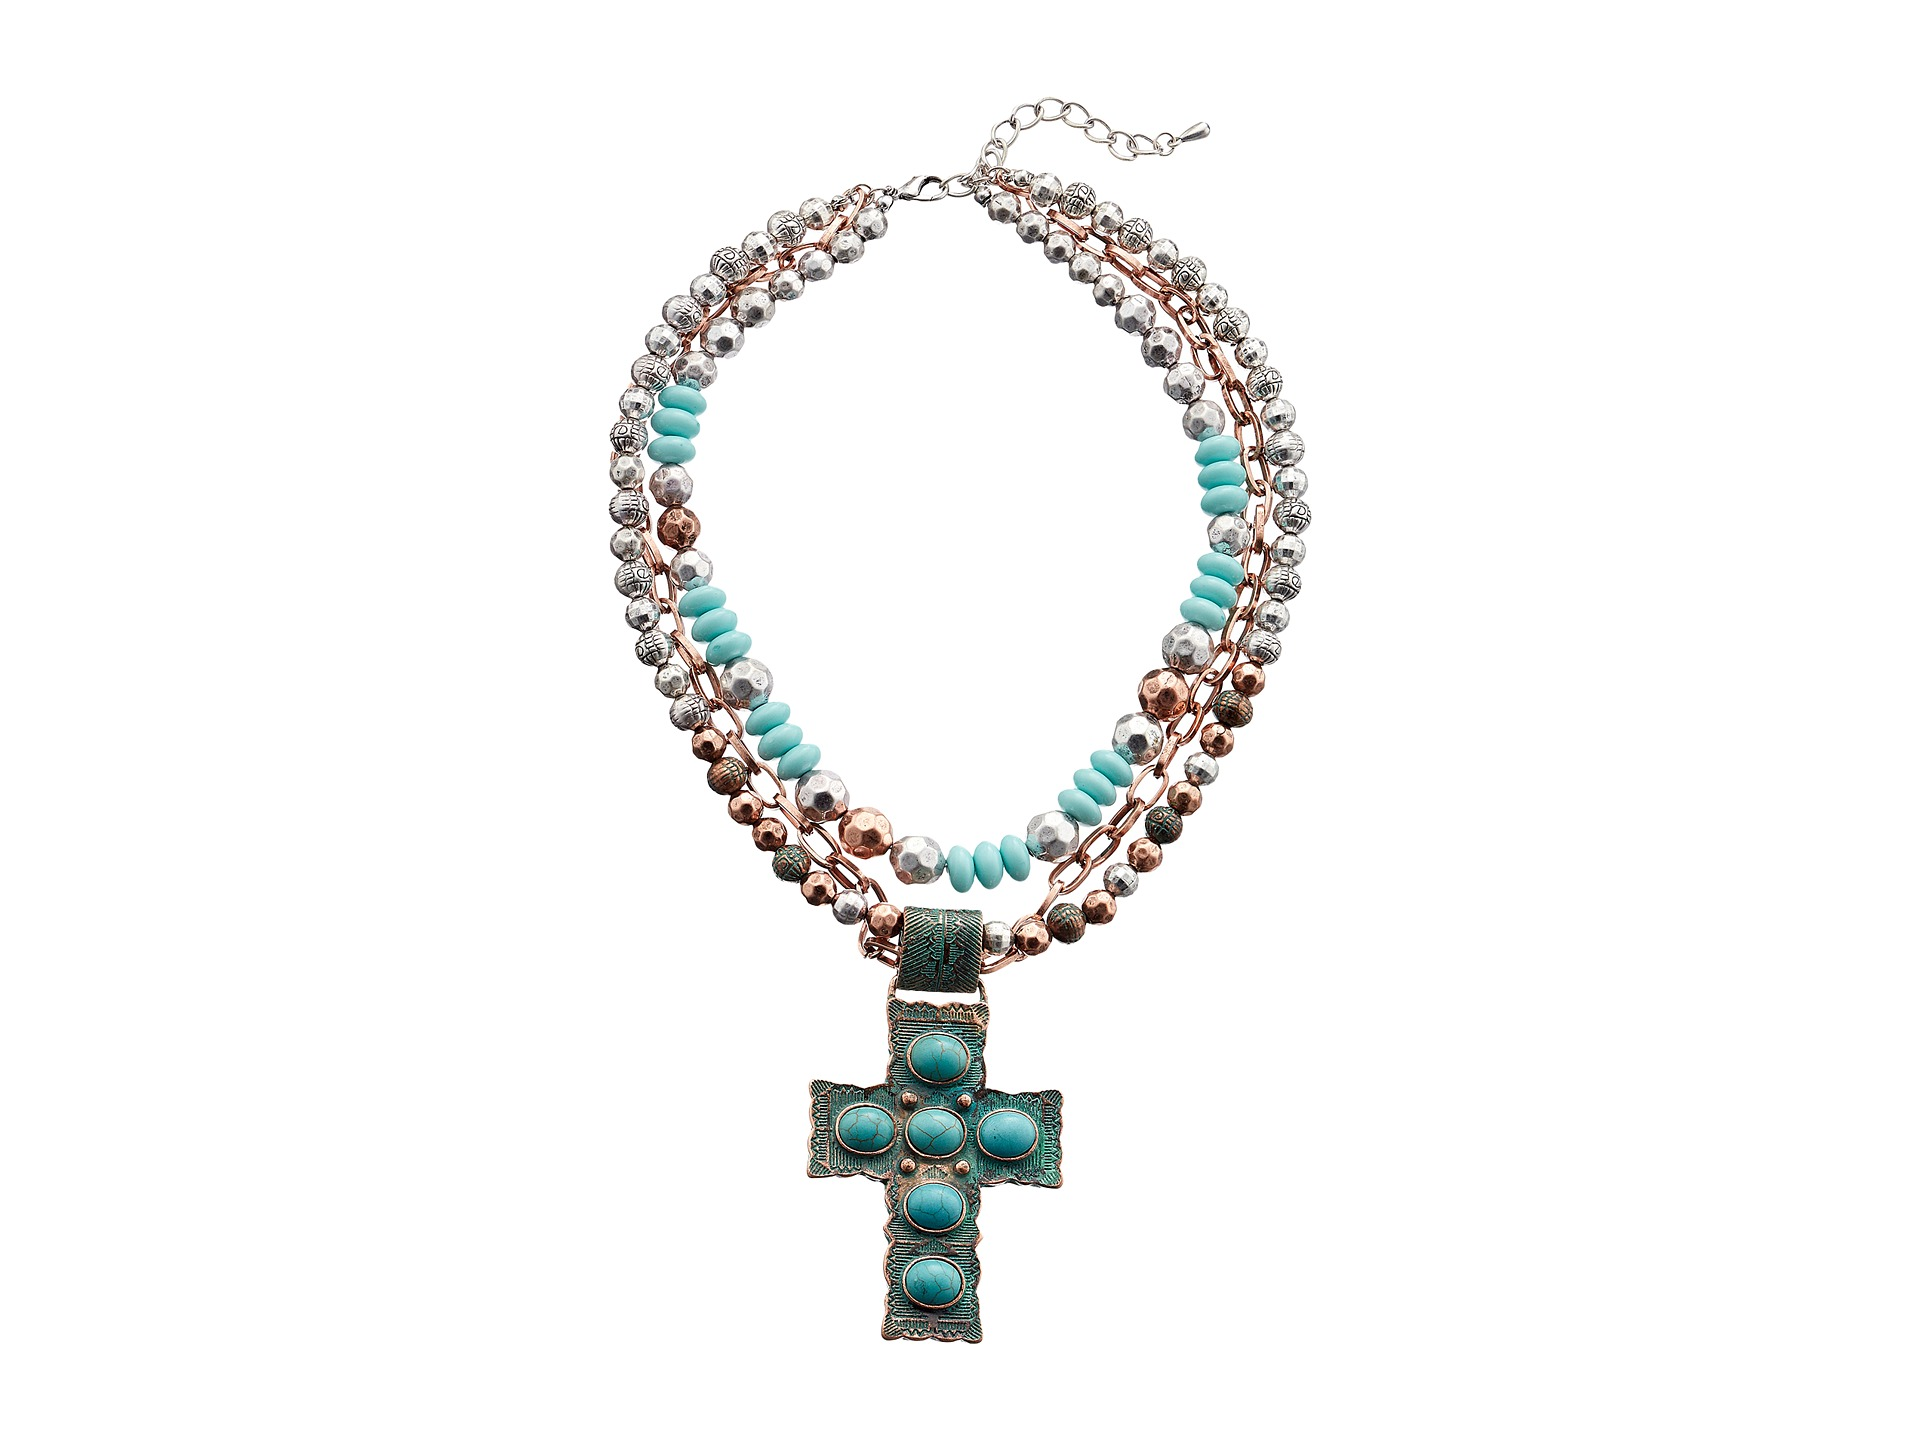 m f western engraved cross pendant necklace earrings set